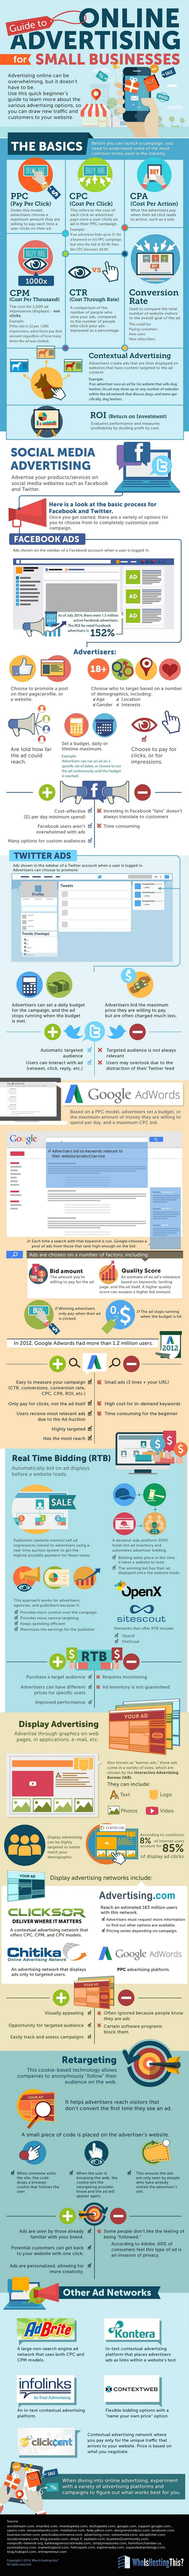 Online-Advertising-Tips